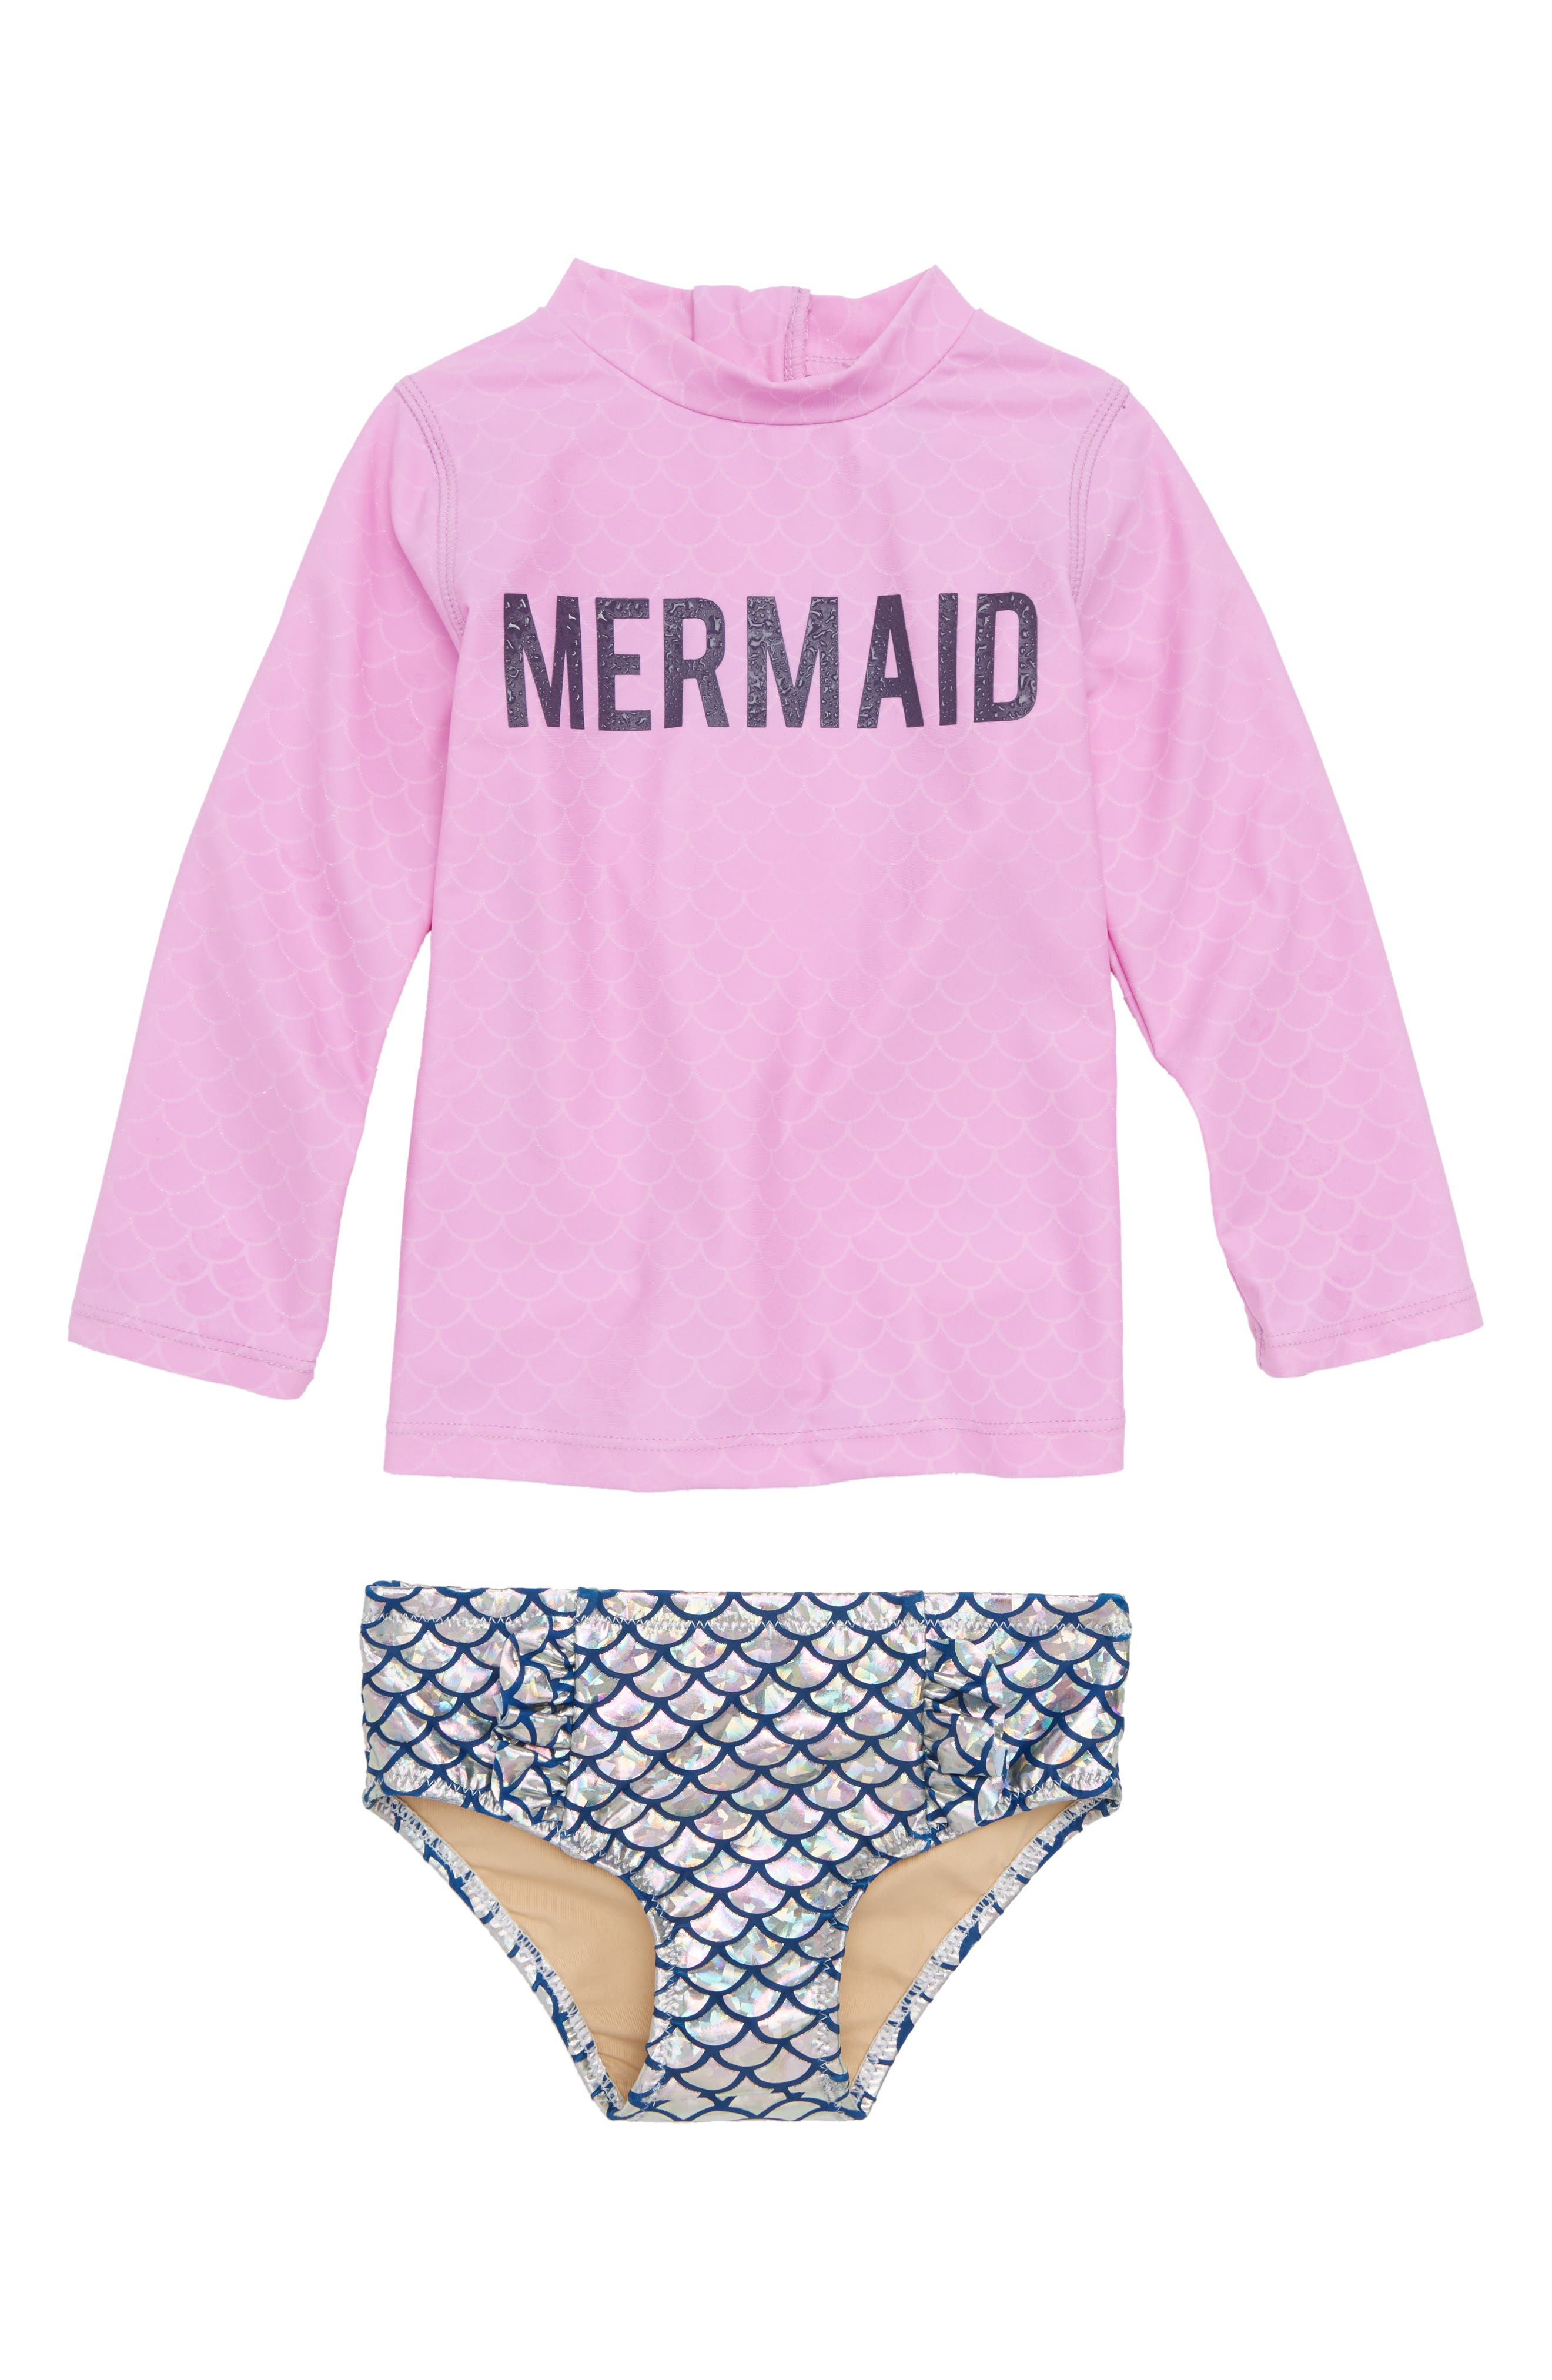 SHADE CRITTERS,                             Mermaid Magic Rashguard Two-Piece Swimsuit,                             Alternate thumbnail 2, color,                             500